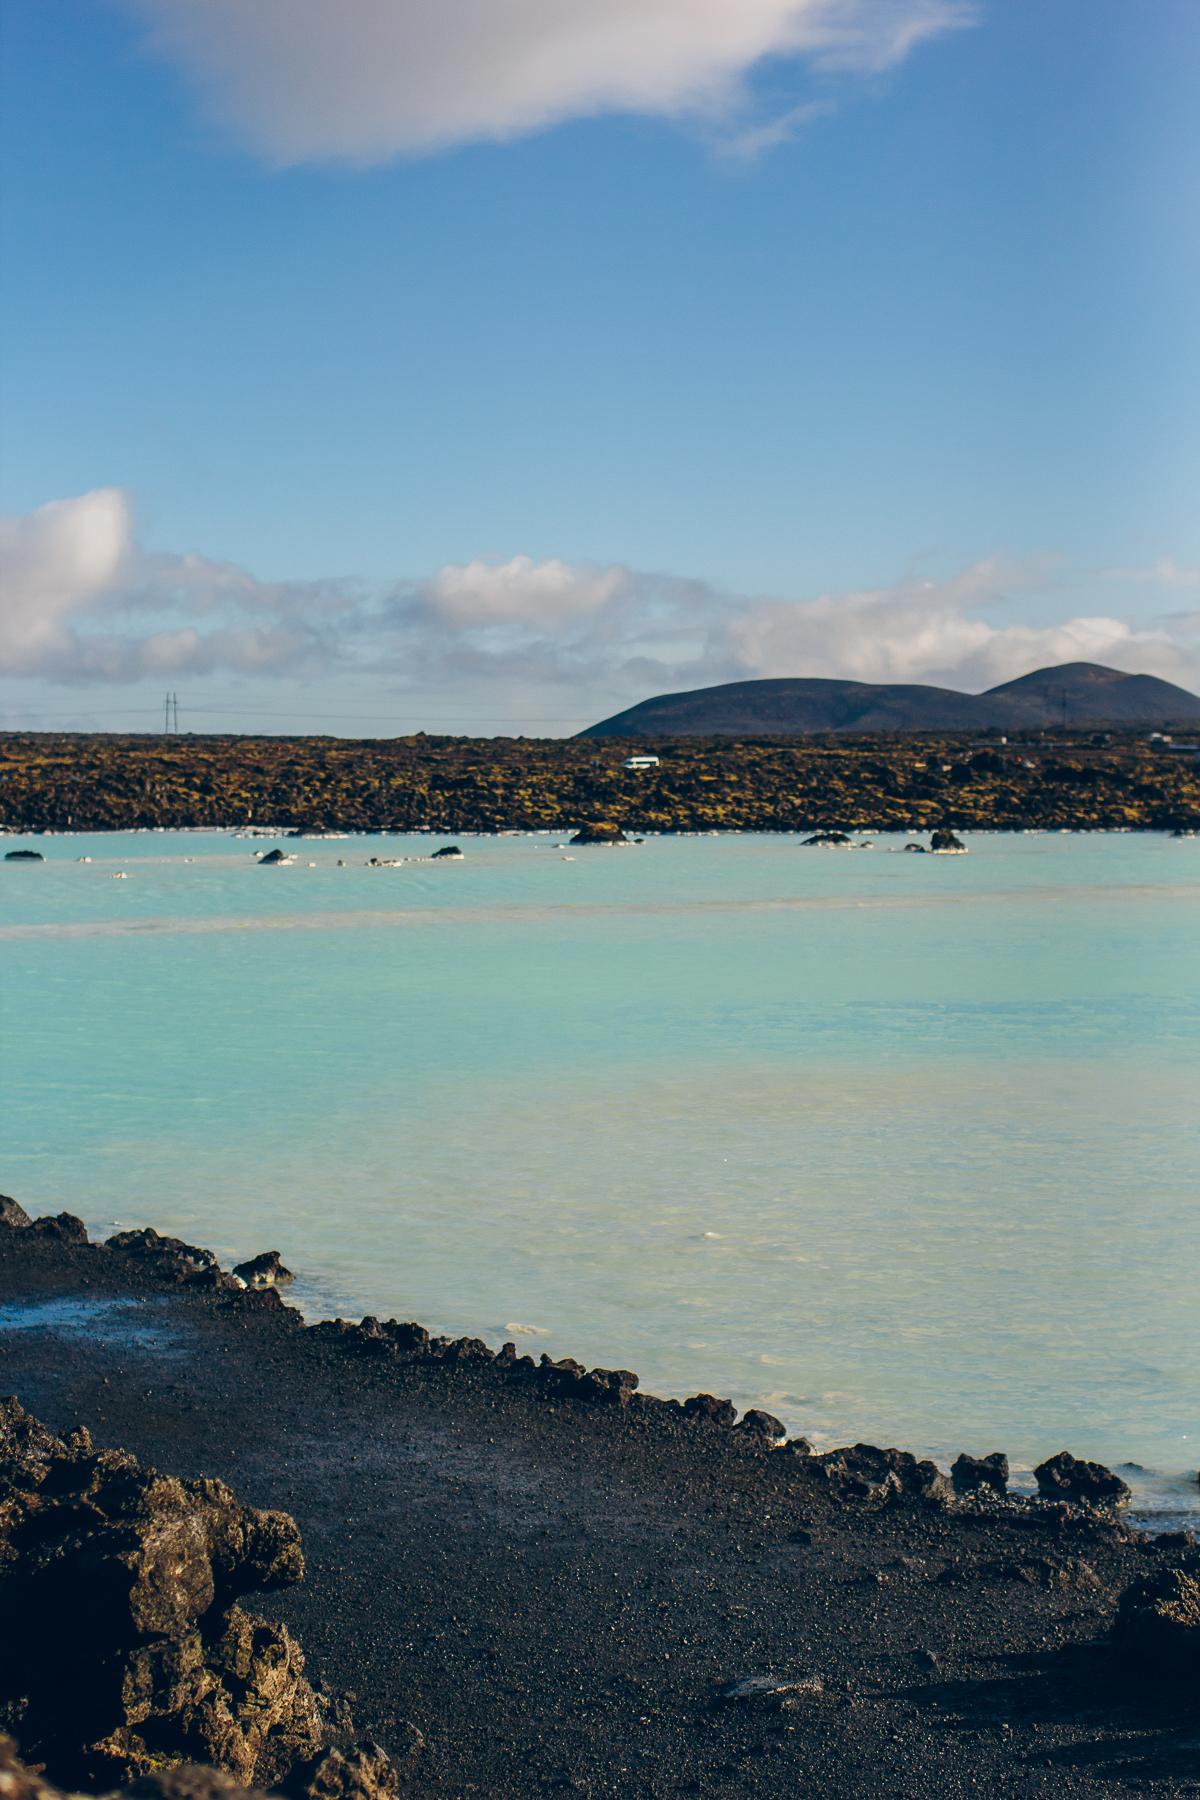 blue lagoon iceland, geothermal pool iceland, Iceland travel guide —via @TheFoxandShe